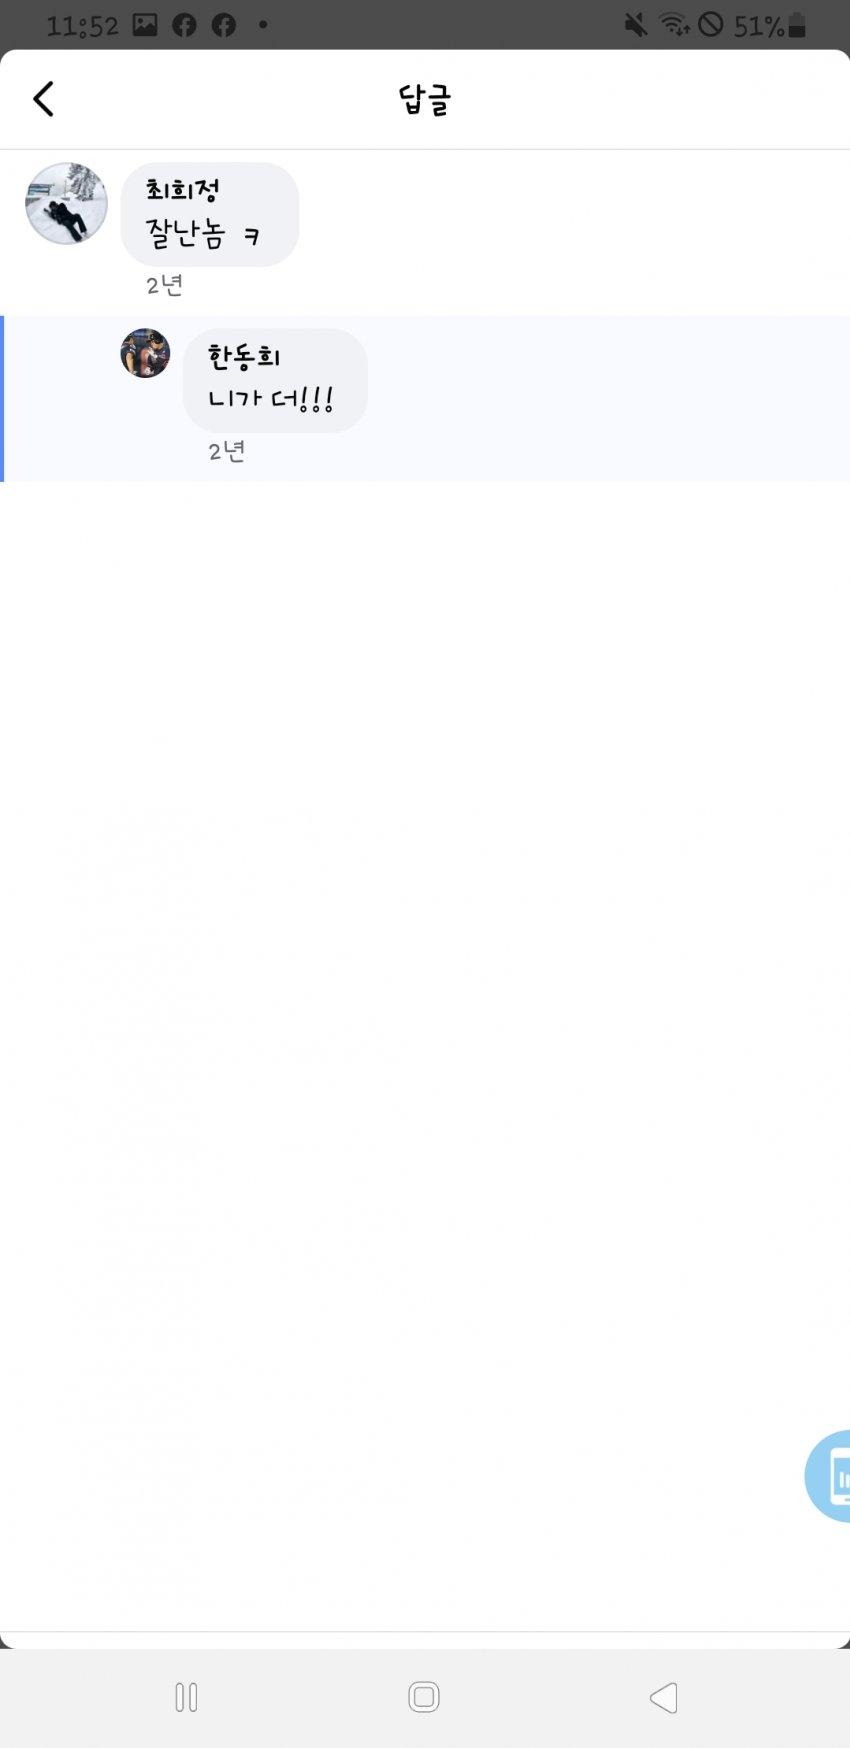 viewimage.php?id=2ab4d128f1c107a86ba884&no=24b0d769e1d32ca73cec86fa11d0283110260b998d7cfa8997b92665228d1b727075dc915a22e06f9e26bc676bde2e31cecb7ef09387120a40c6131b7e7922d025df3b990a667124d0b22ad9b2850aebc503984258a9d602defa8bc0ccbcf3bfc98e1898db7f5ab46347